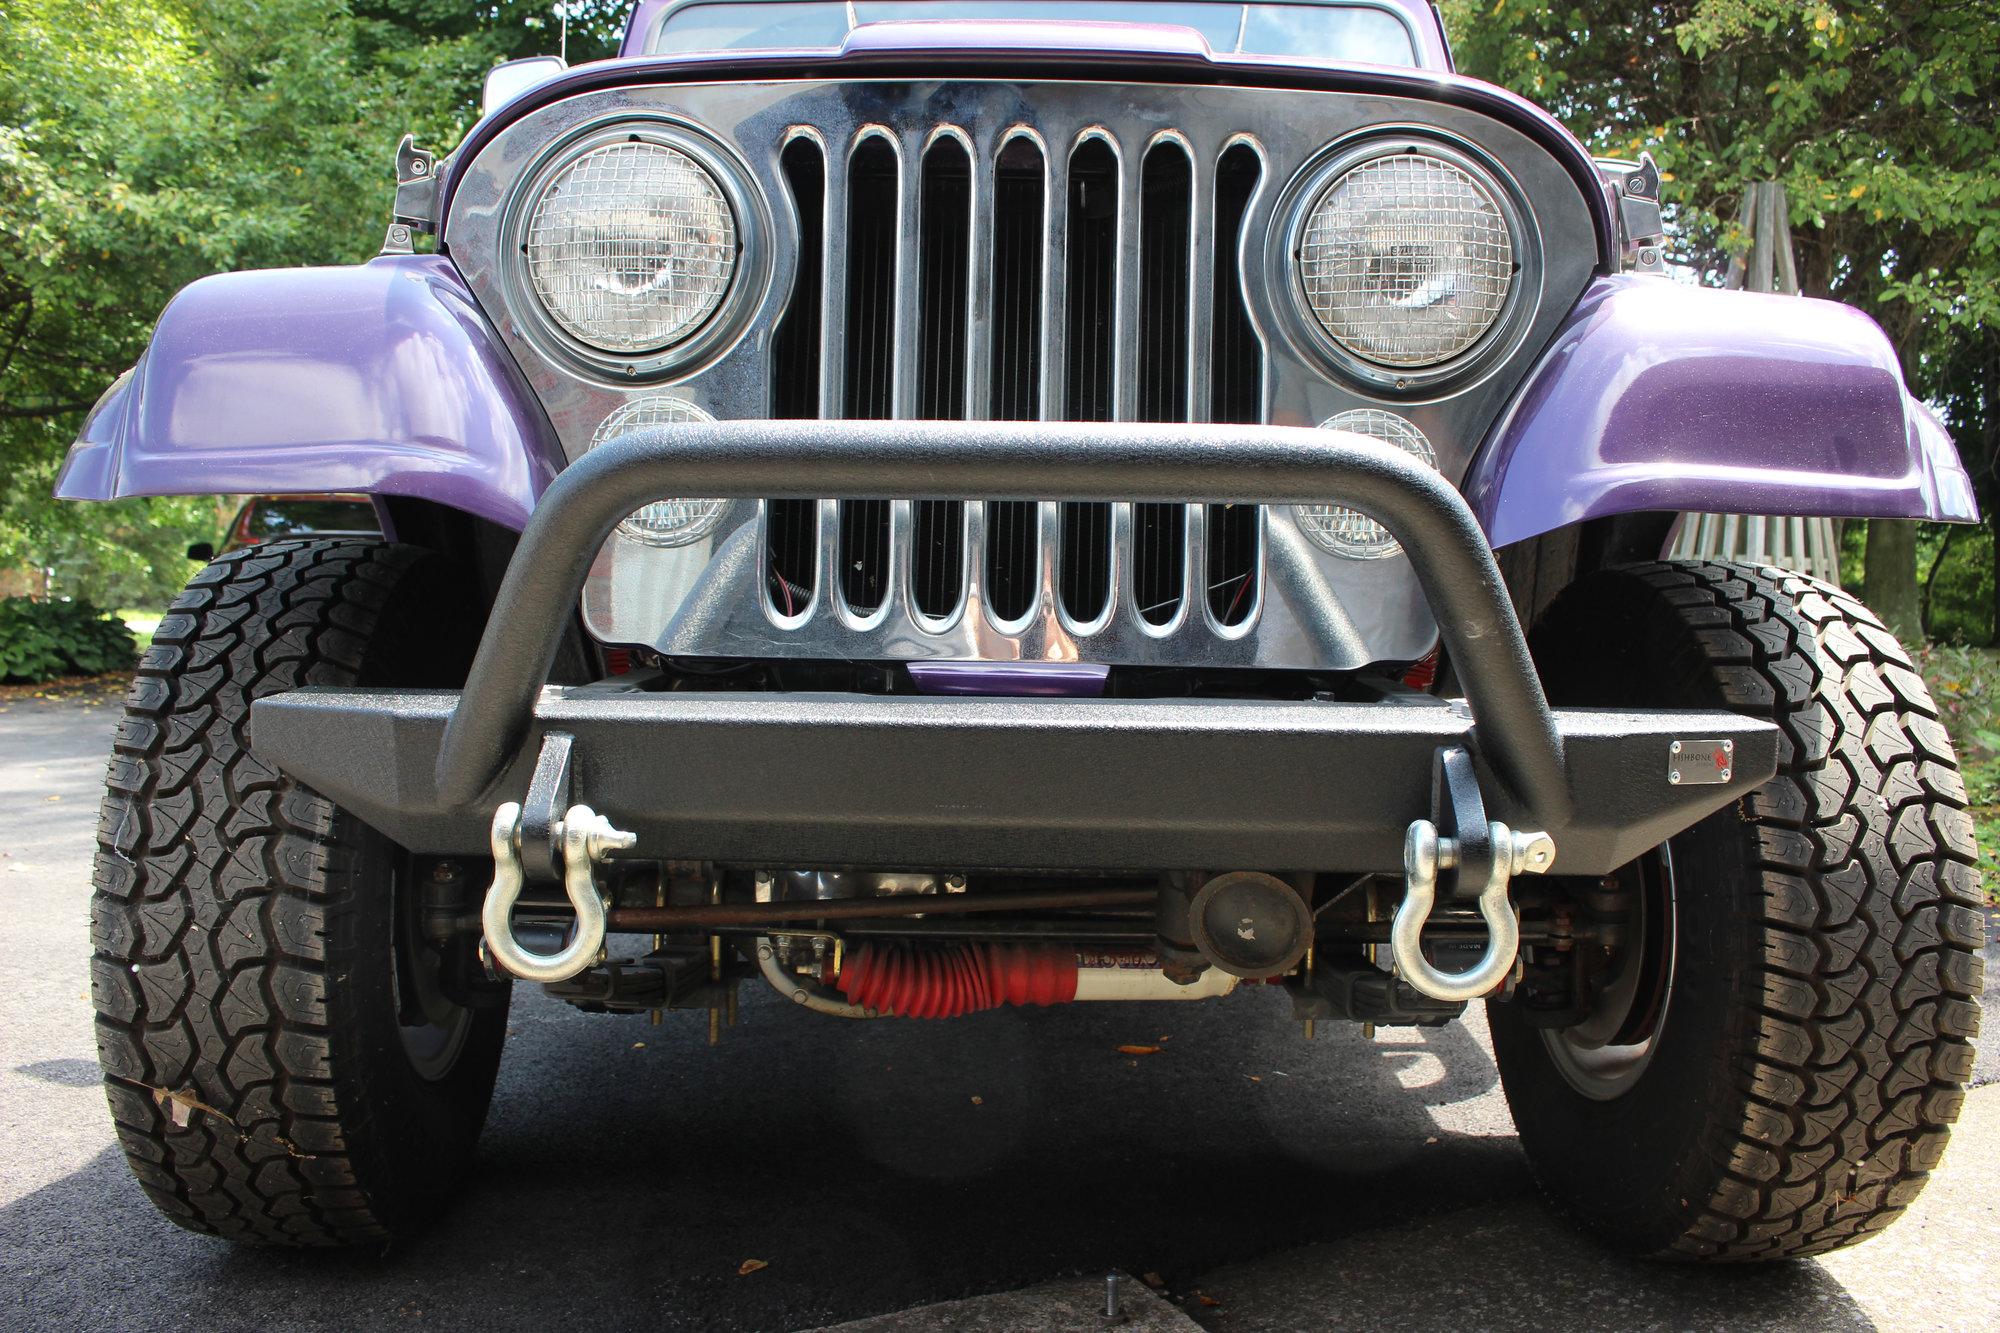 hight resolution of fishbone offroad fb22080 piranha front bumper for 76 95 jeep cj wrangler yj quadratec